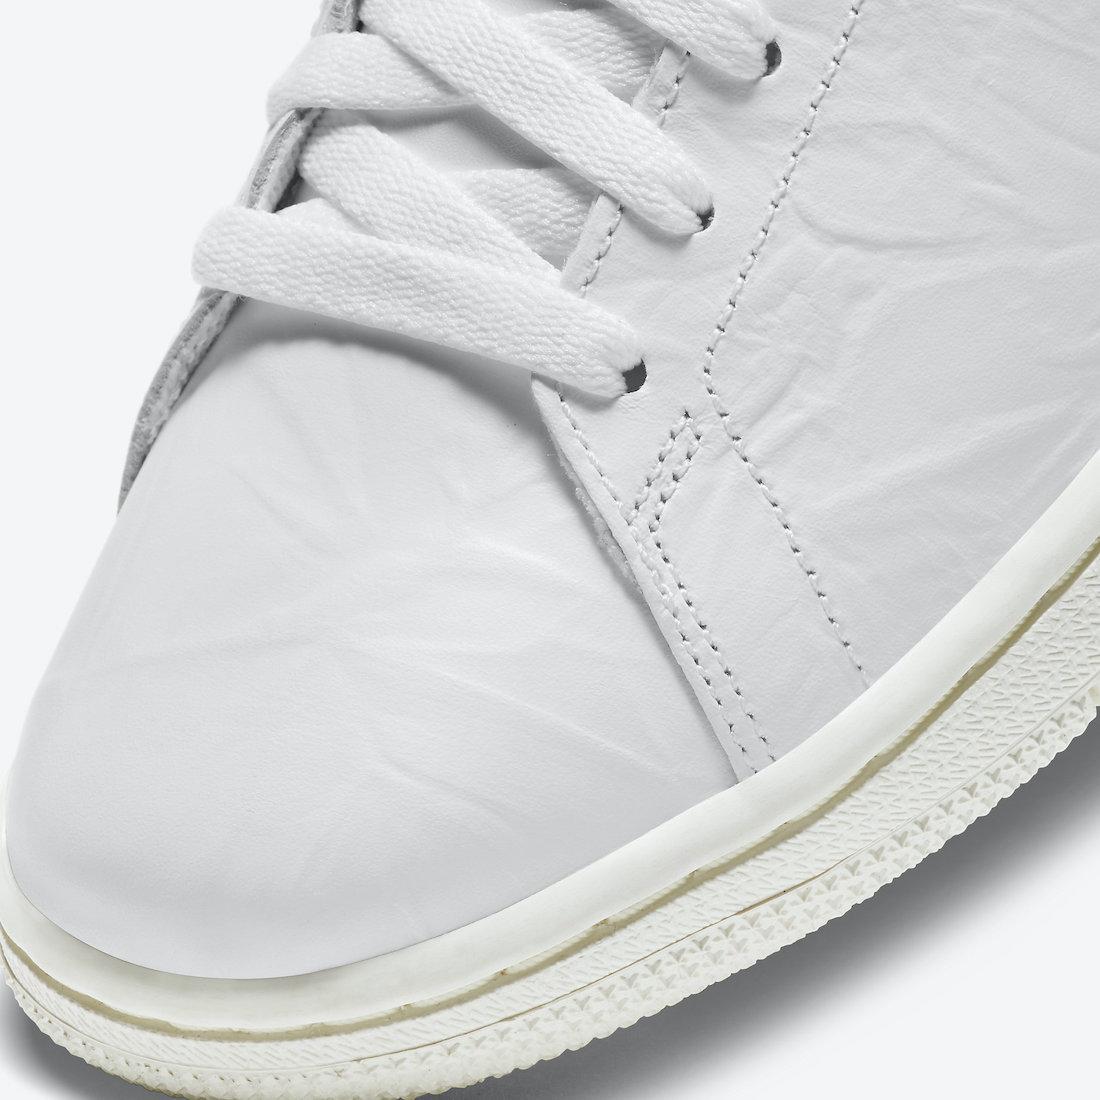 Air-Jordan-1-Centre-Court-White-University-Red-DJ2756-101-Release-Date-6